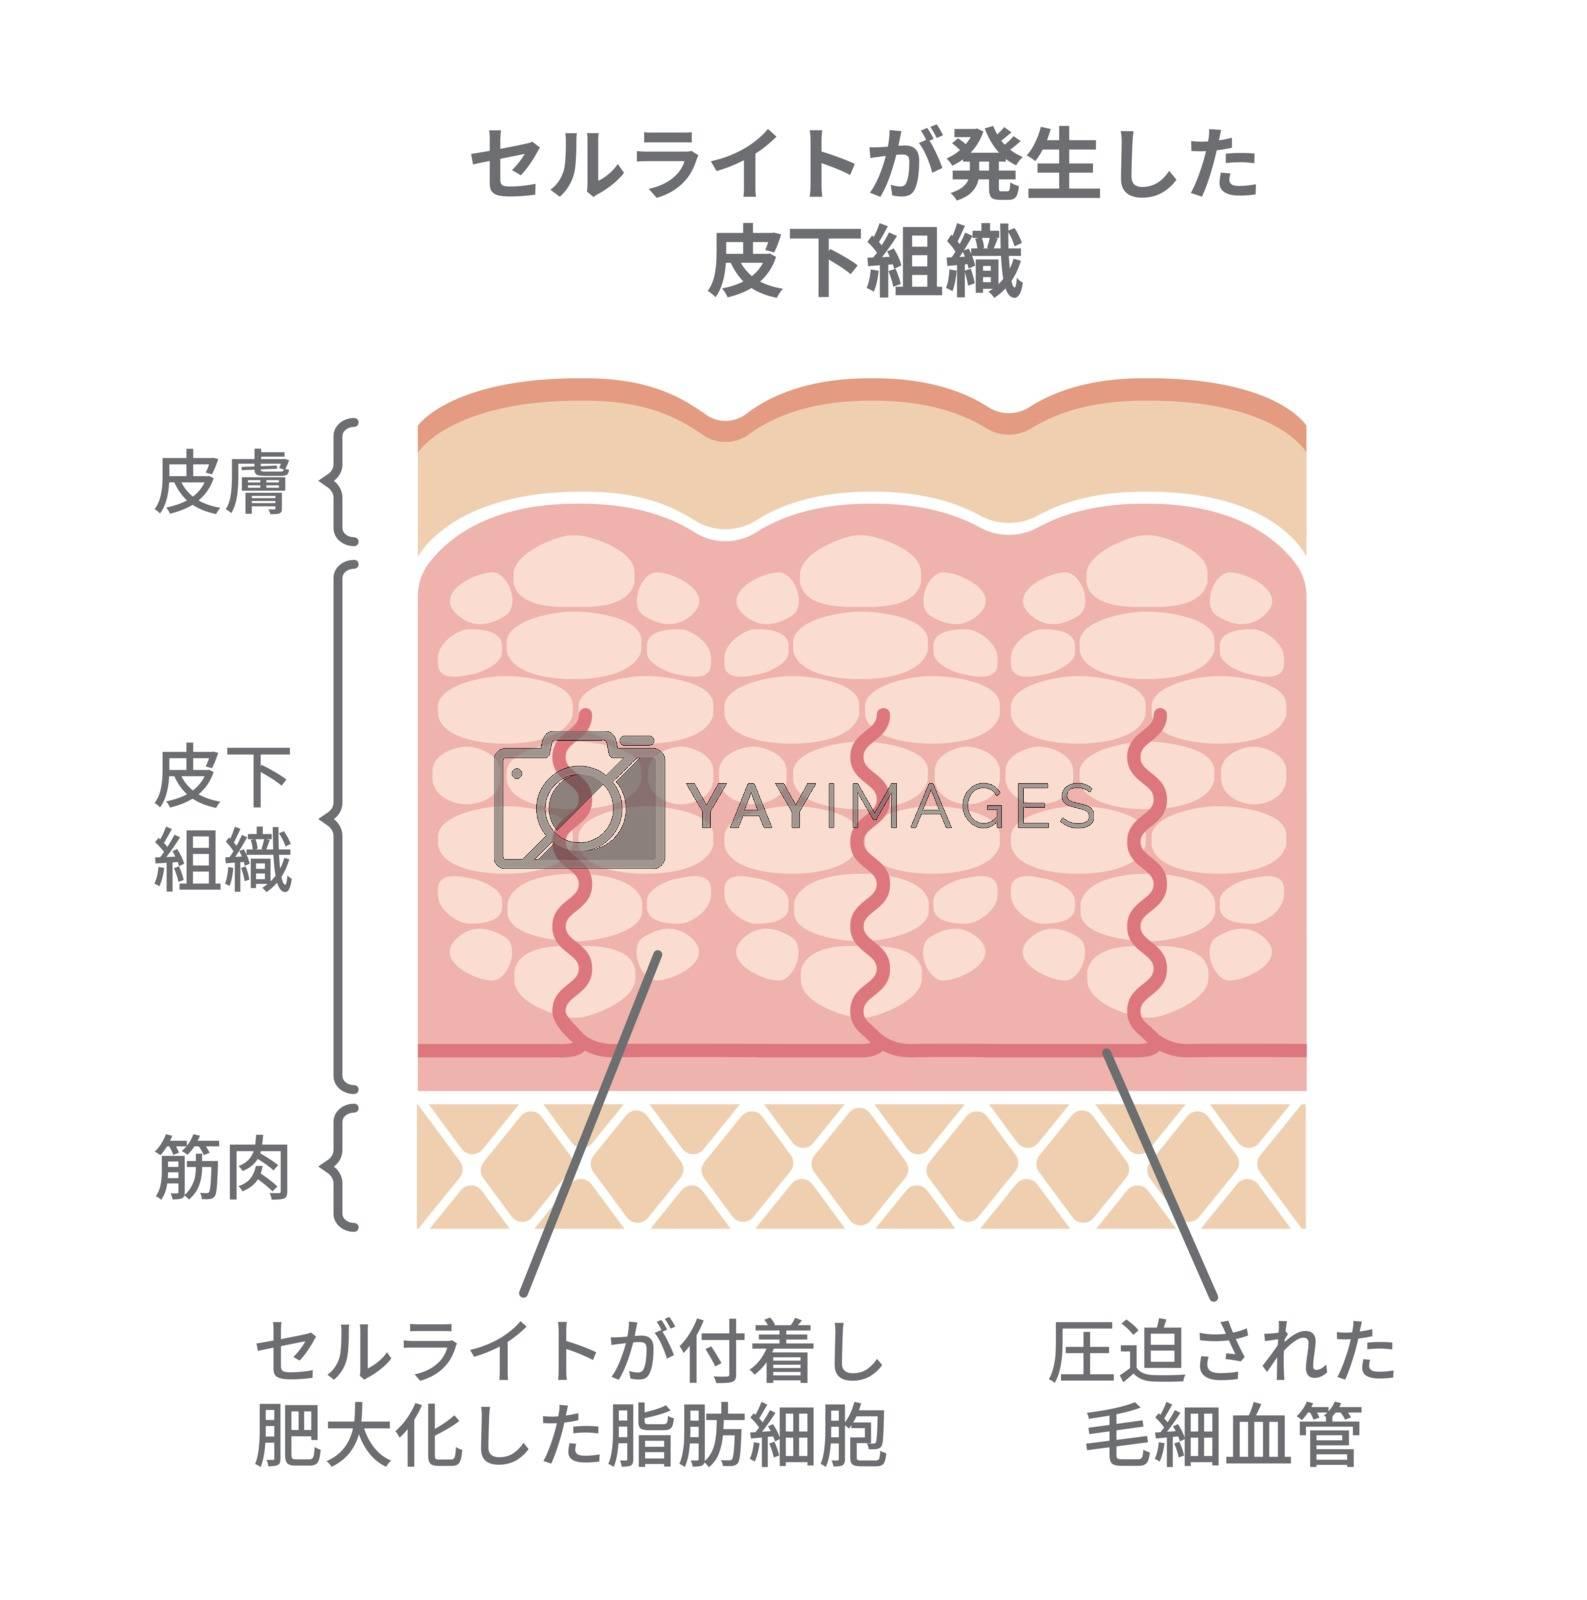 Cellulite's skin illustration